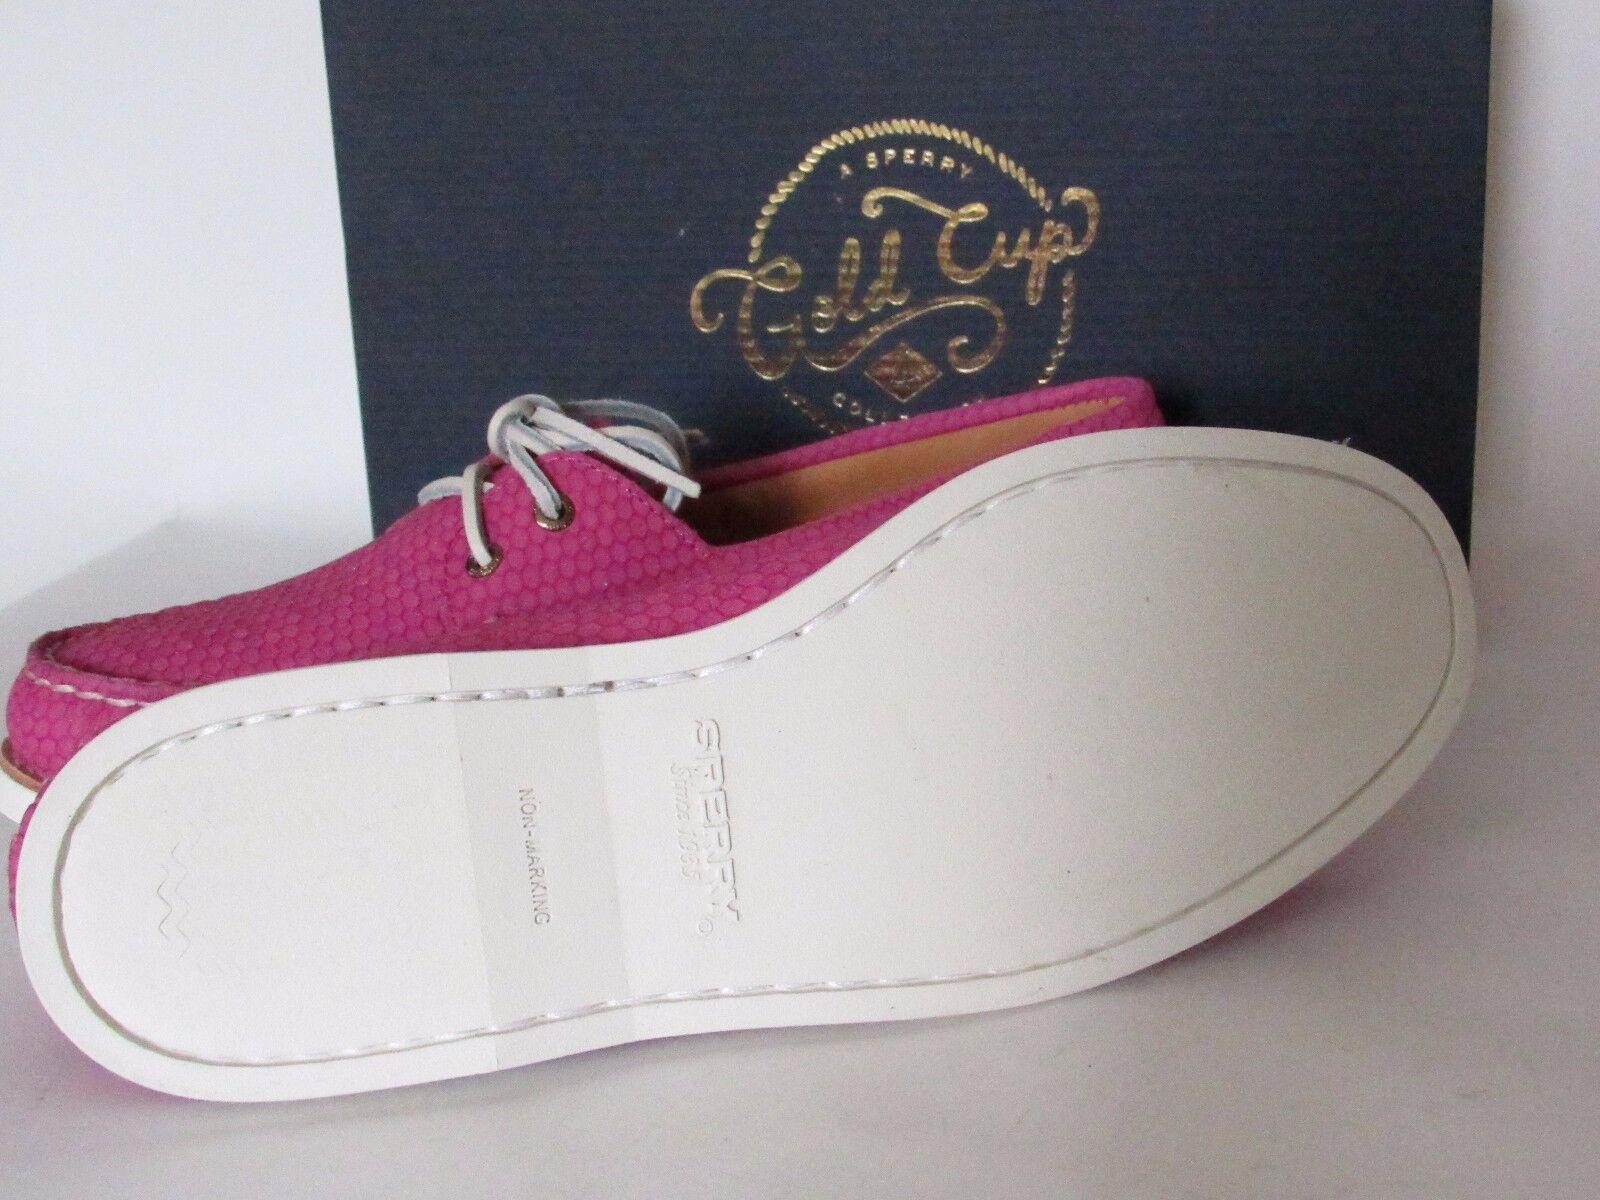 Pikolinos Black Short Leather Mule Slide Casual Short Black Heel Shoes Women's 39 / 8.5-9 739075